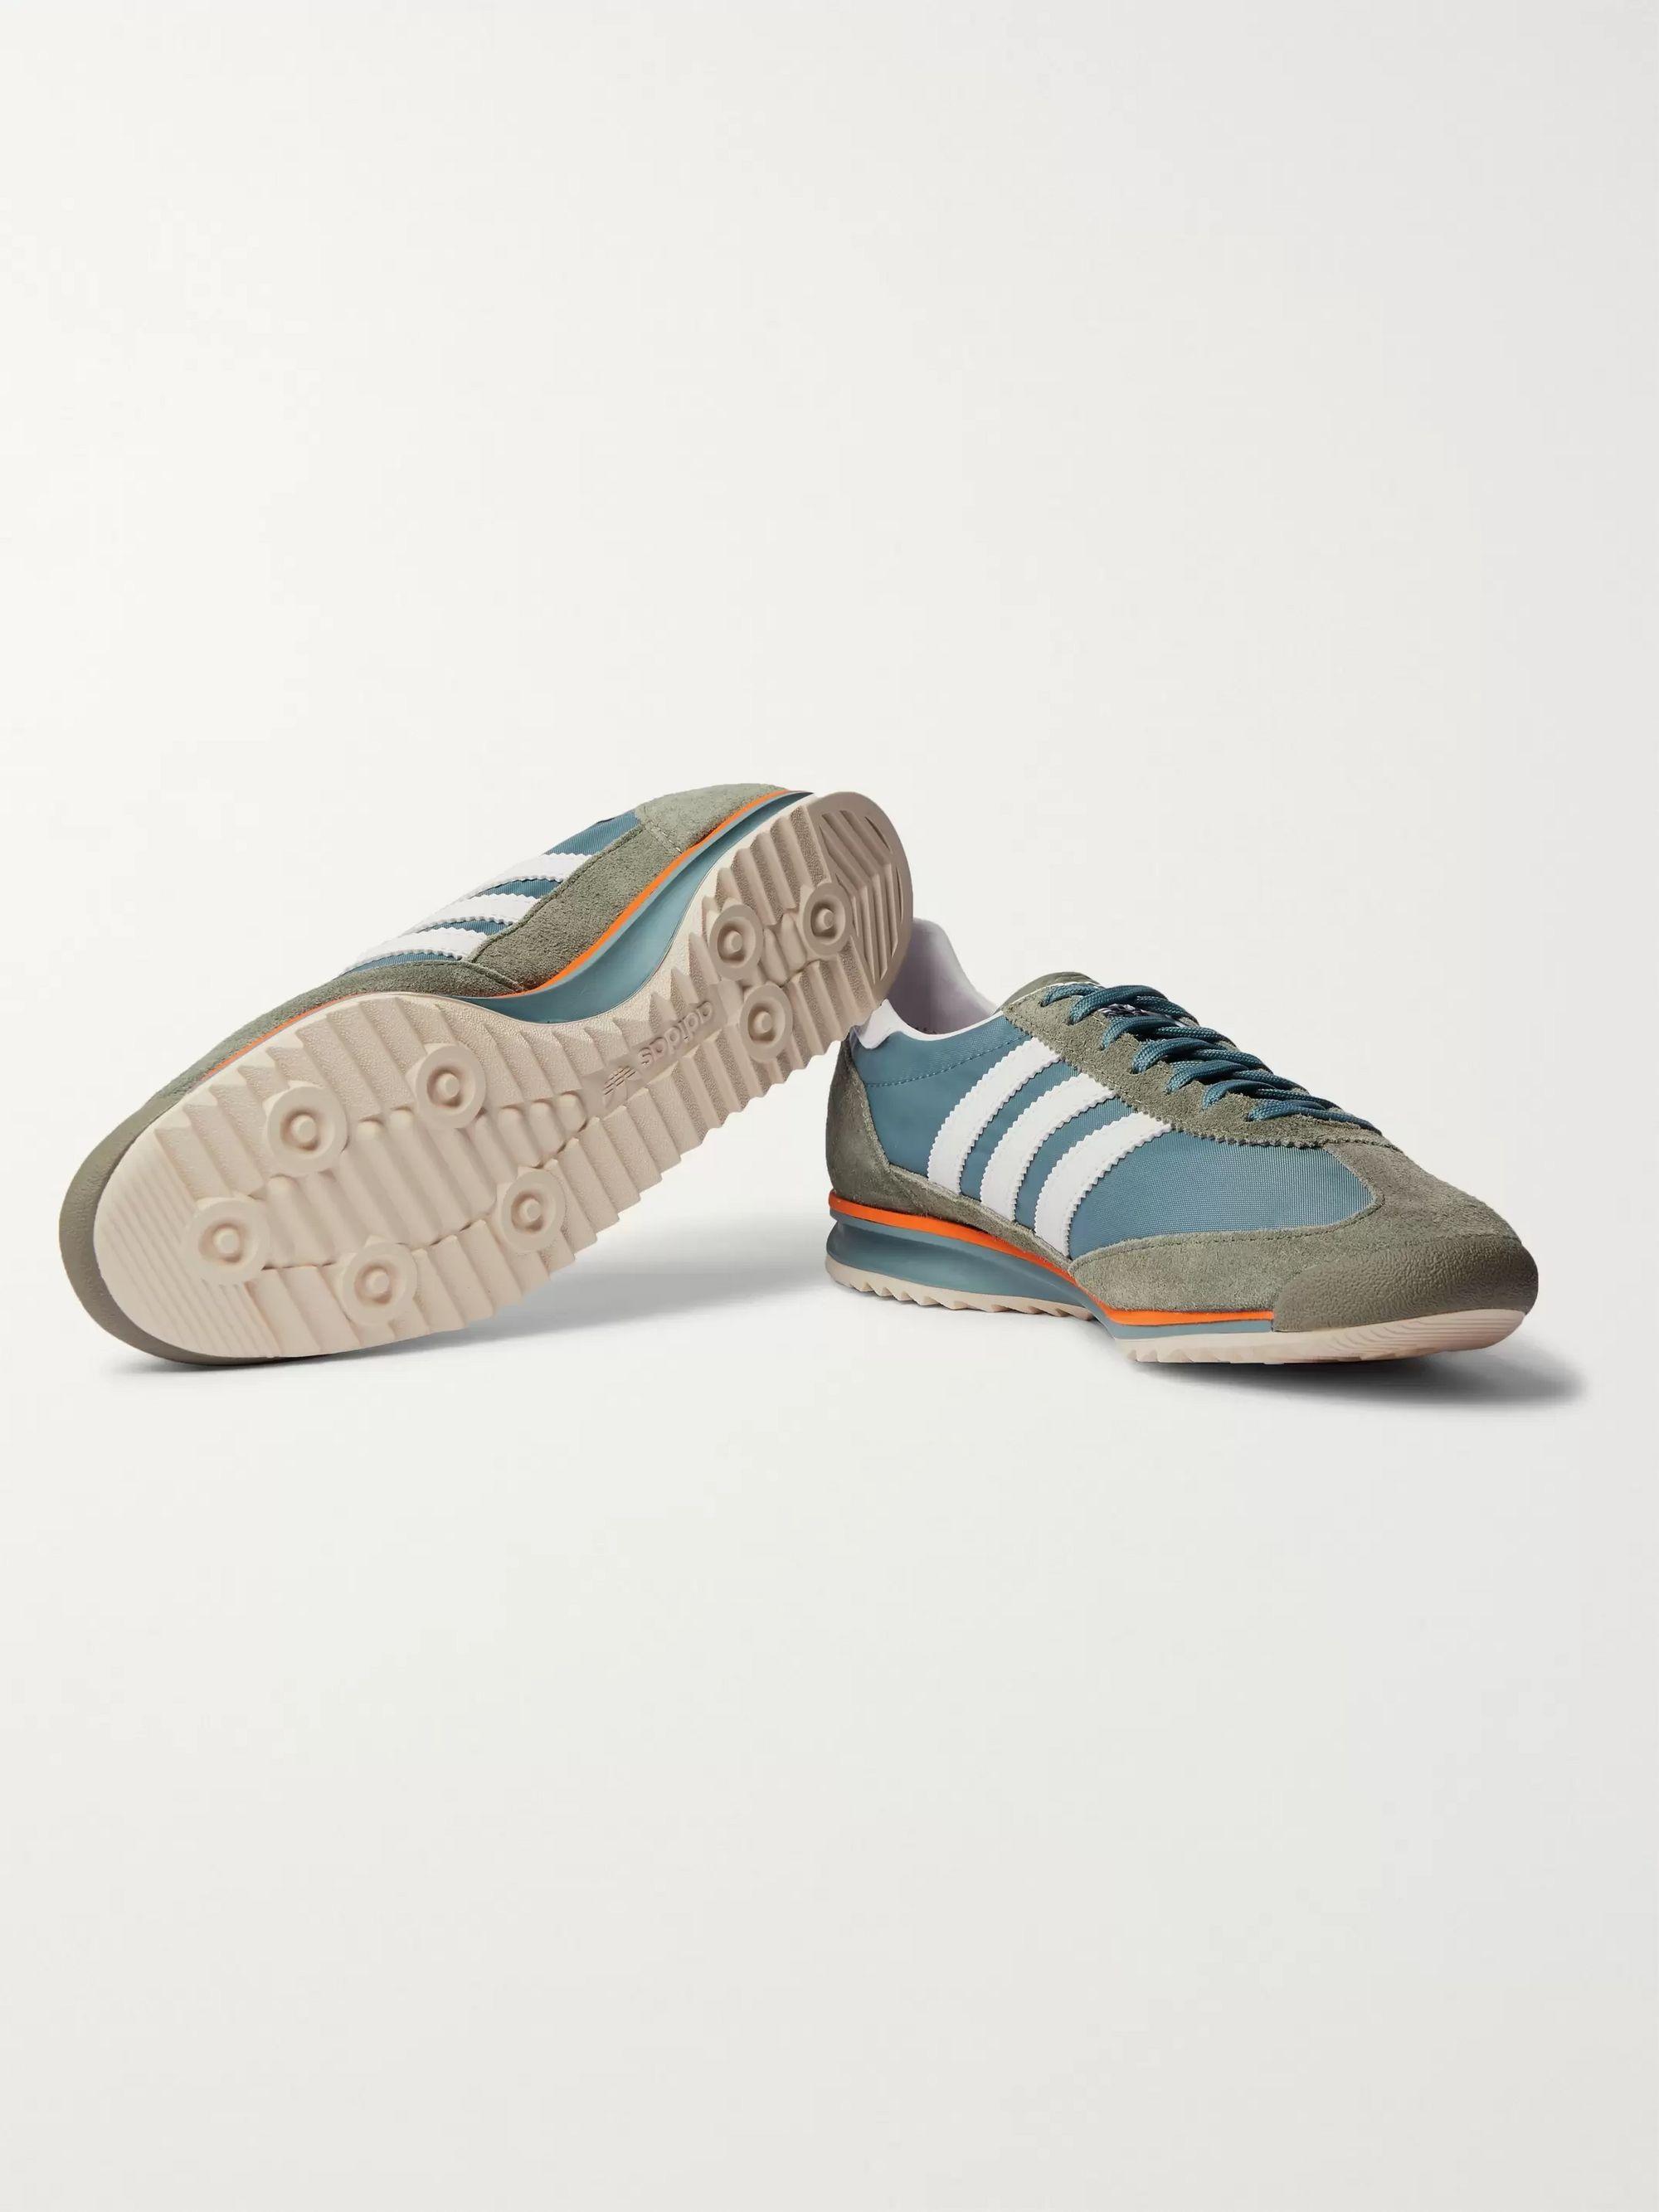 adidas Spezial shoes olive green orange